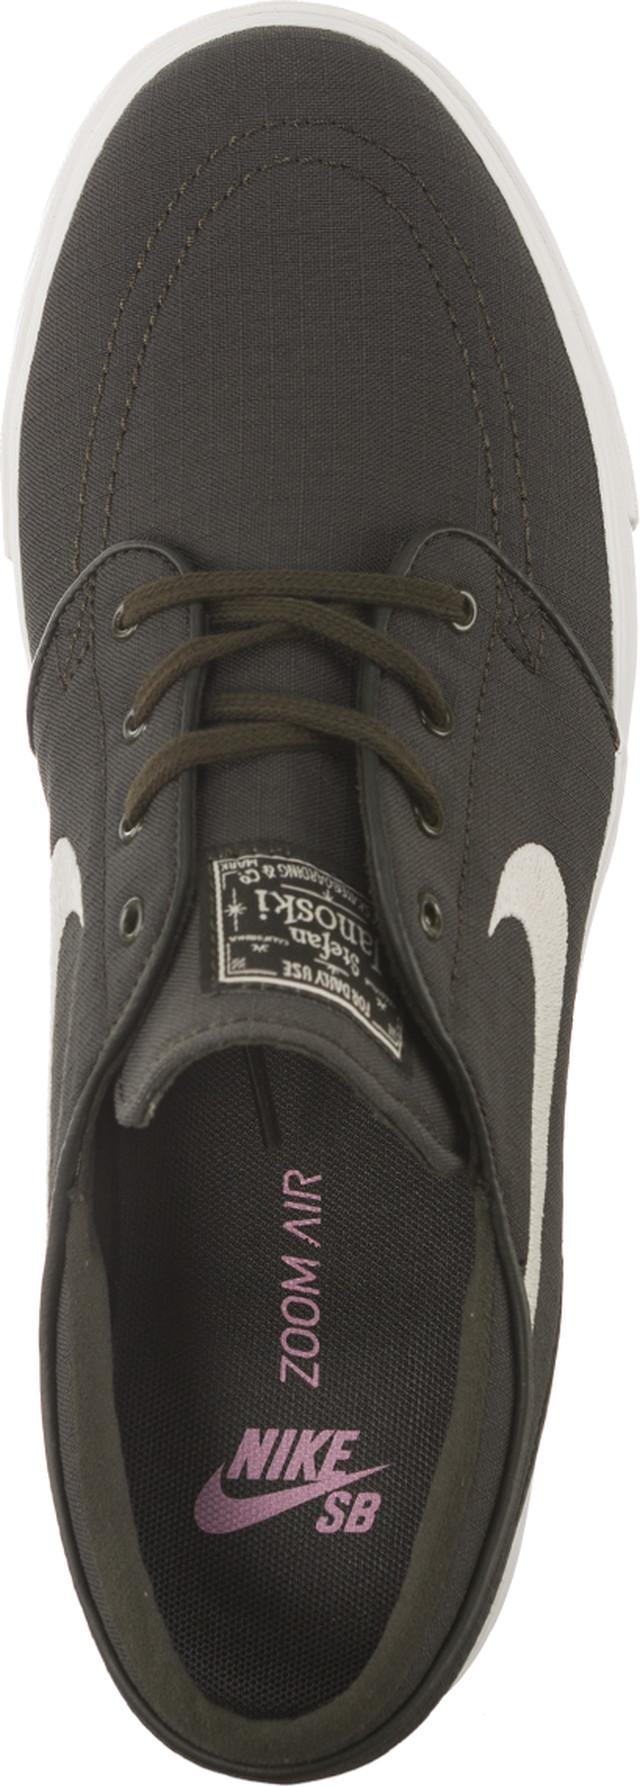 ce53849d4db54f Buty Nike ZOOM STEFAN JANOSKI CANVAS sequoia light bone summit white ...